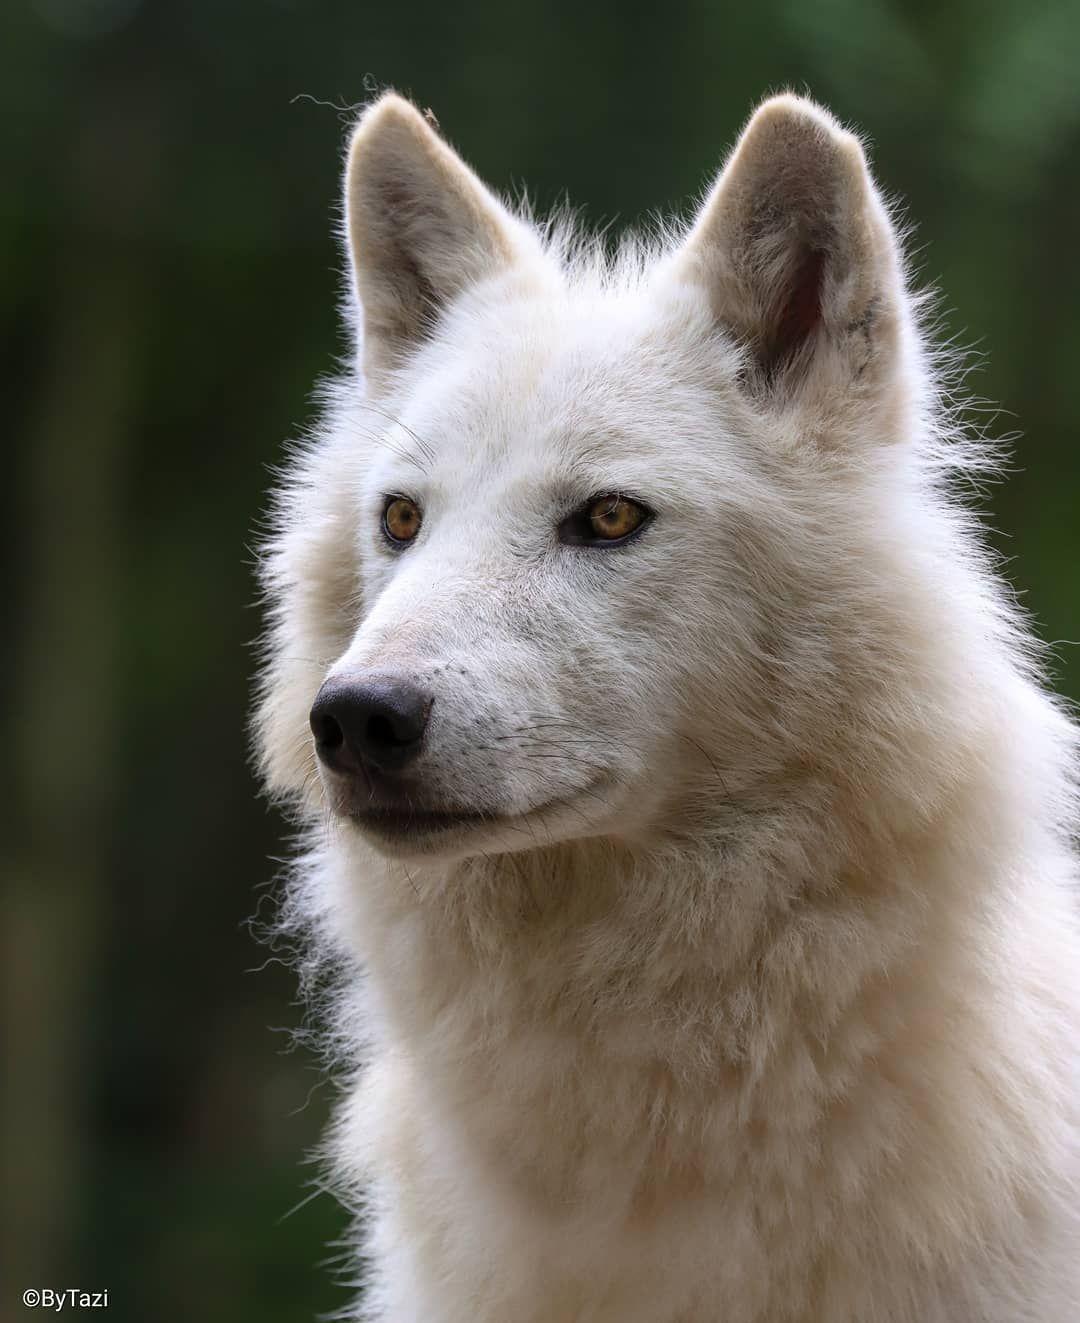 "By Tazi on Instagram: ""Hudson Bay wolf #hudsonbaywolf #wolf #wolfsofinstagram #wolfs #wolflovers #animal #canislupus #ByTazi #wildlifephotography #wildgeography…"""